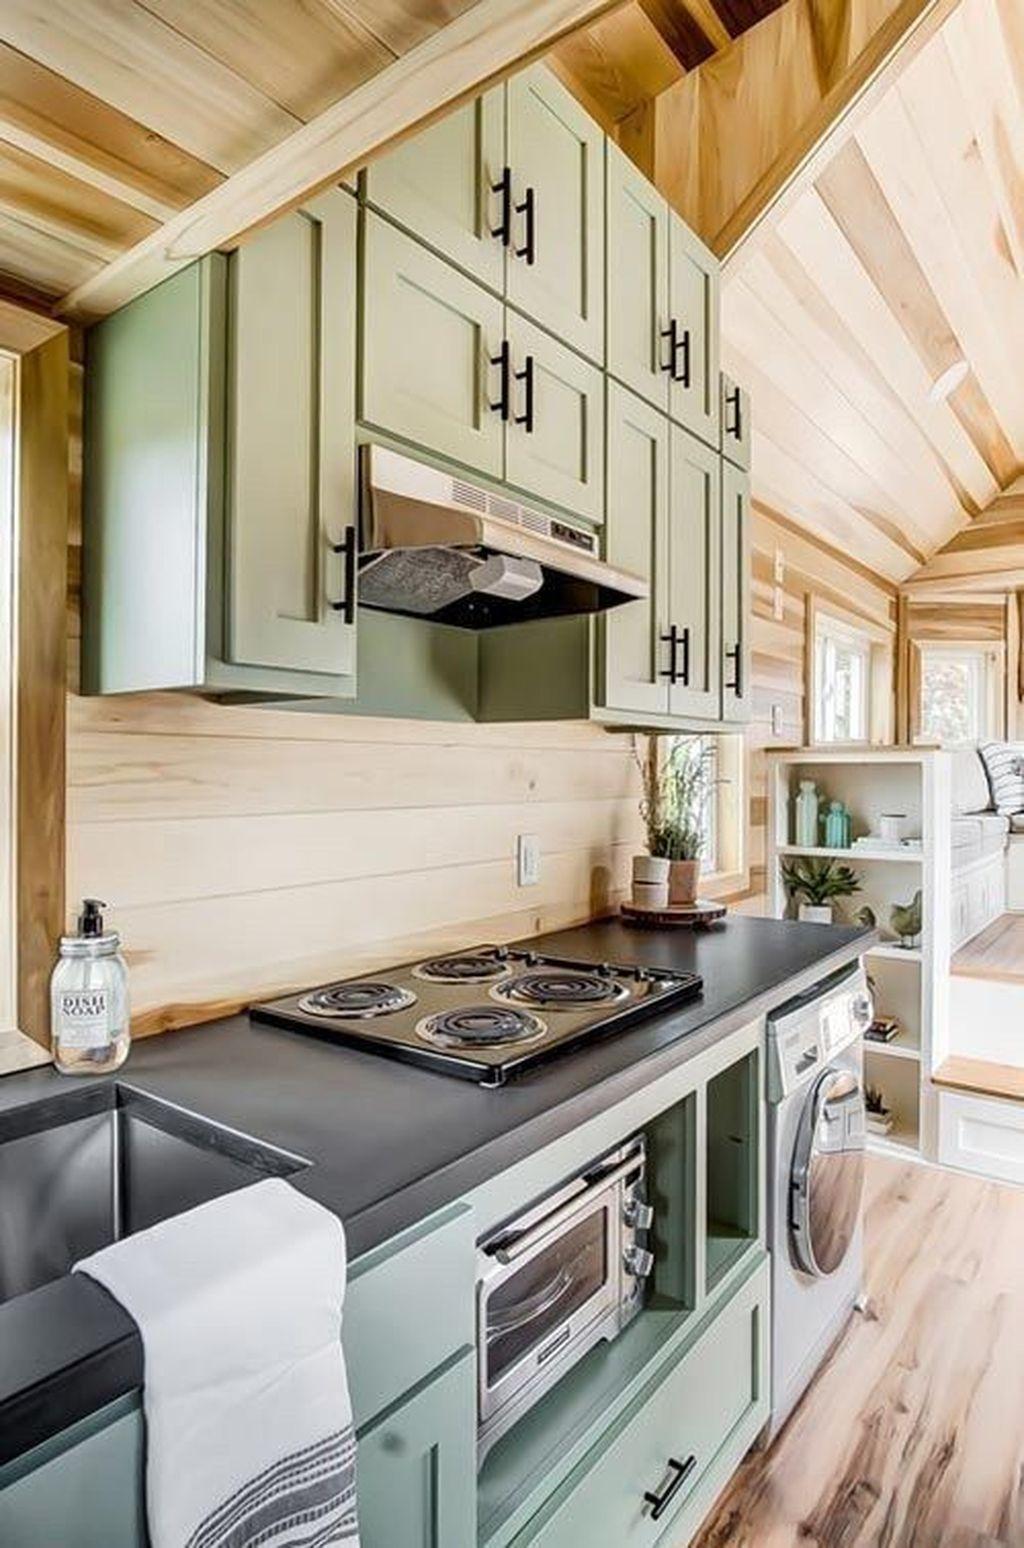 30 Wonderful Kitchen Cabinets Ideas